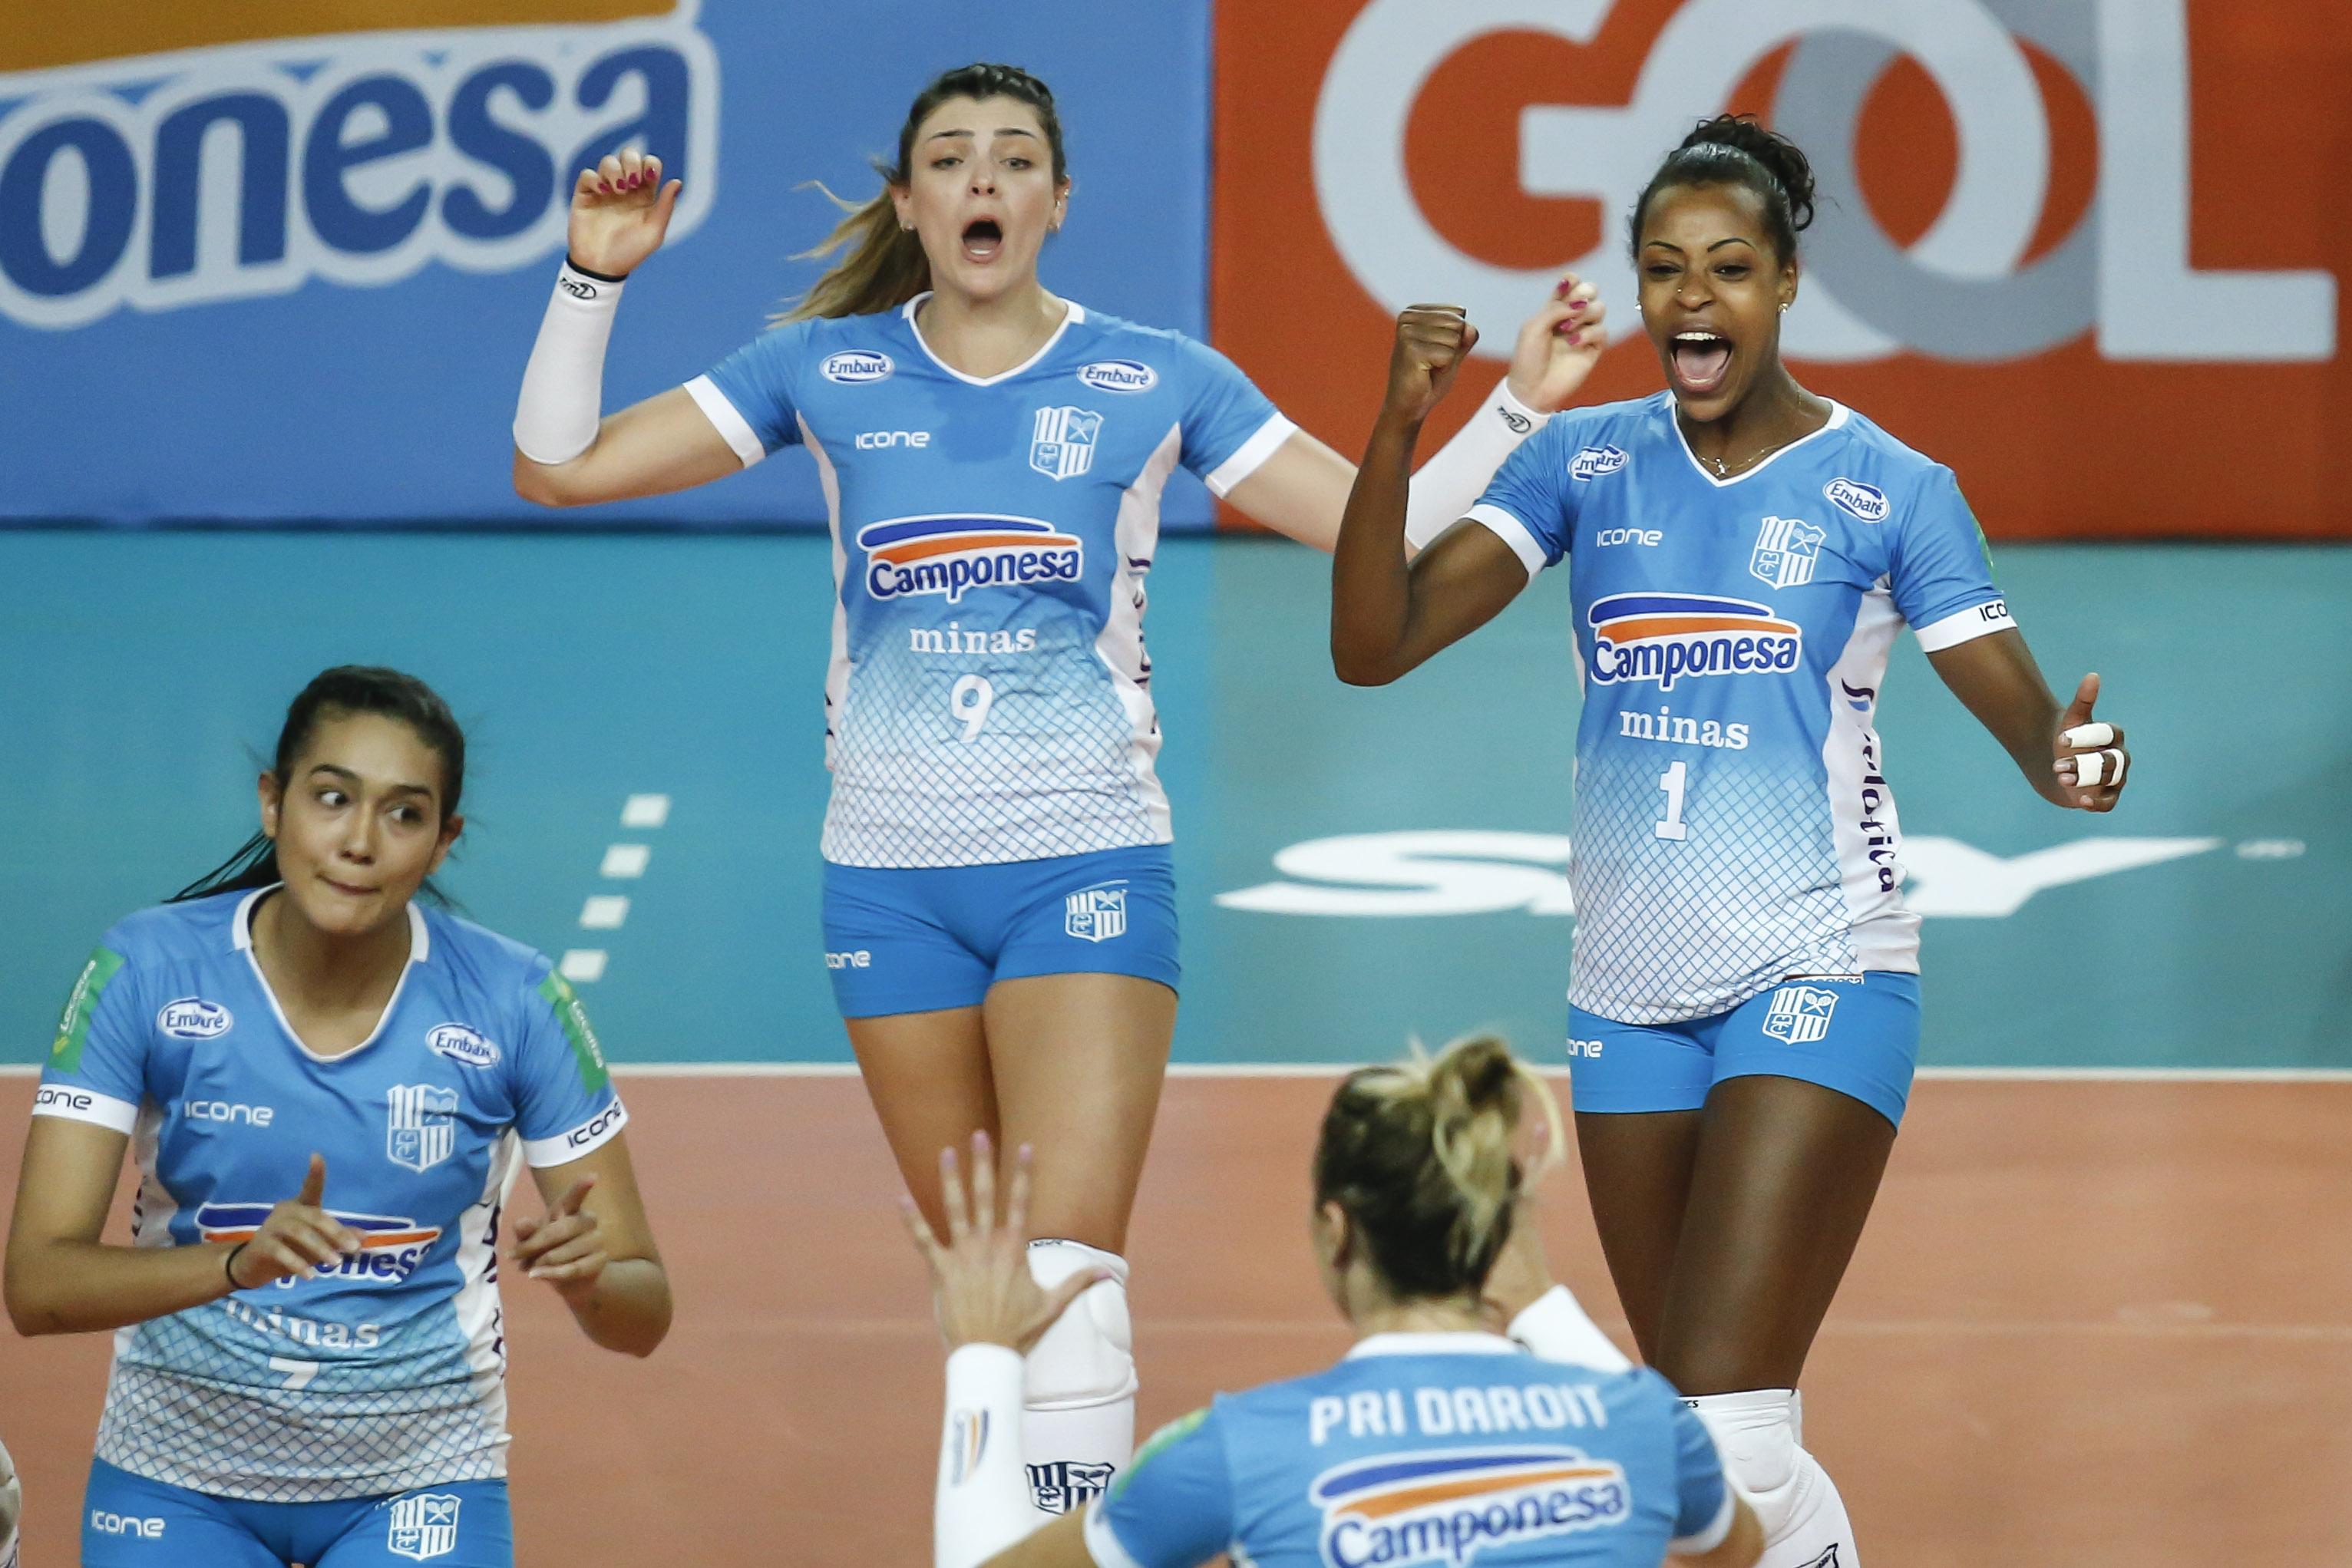 Camponesa/Minas enfrenta o Pinheiros nesta sexta-feira